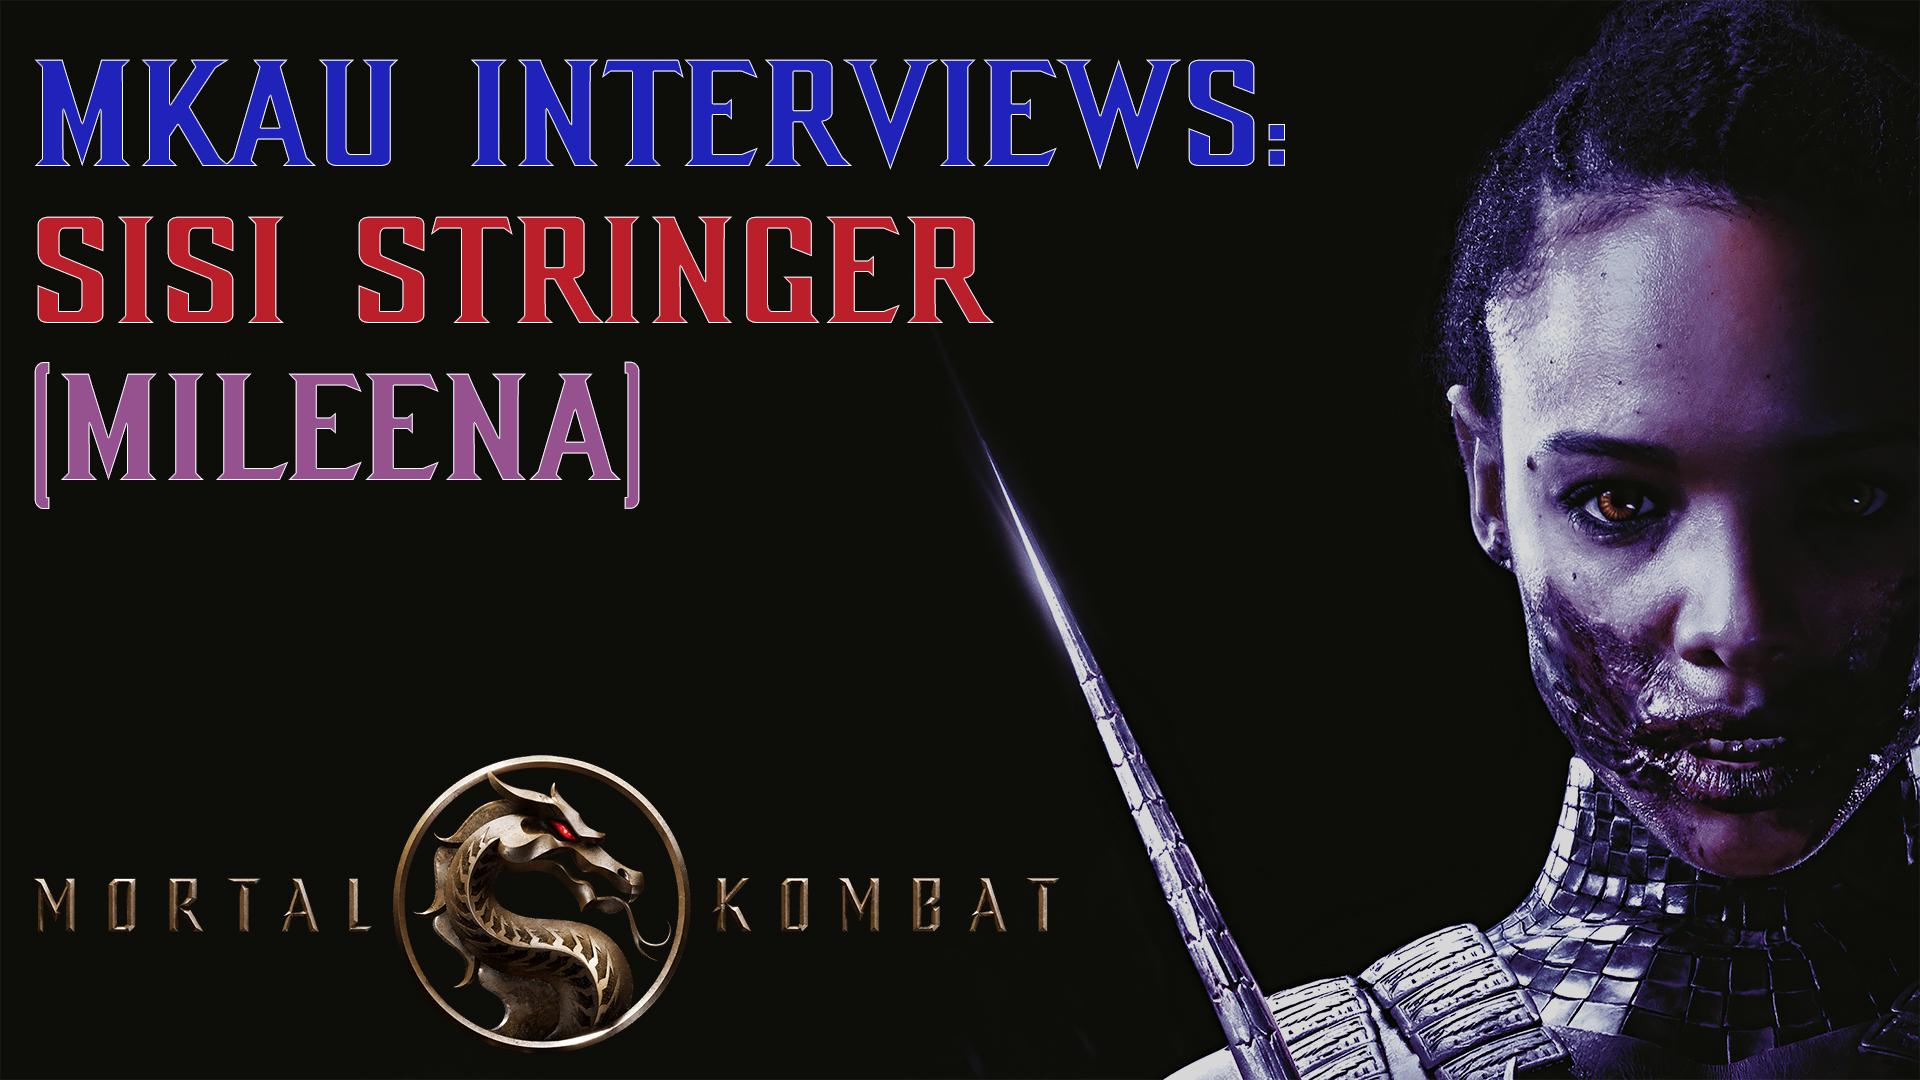 "MKAU Interviews: Sisi Stringer ""MILEENA"" From The New Mortal Kombat Movie (2021)"